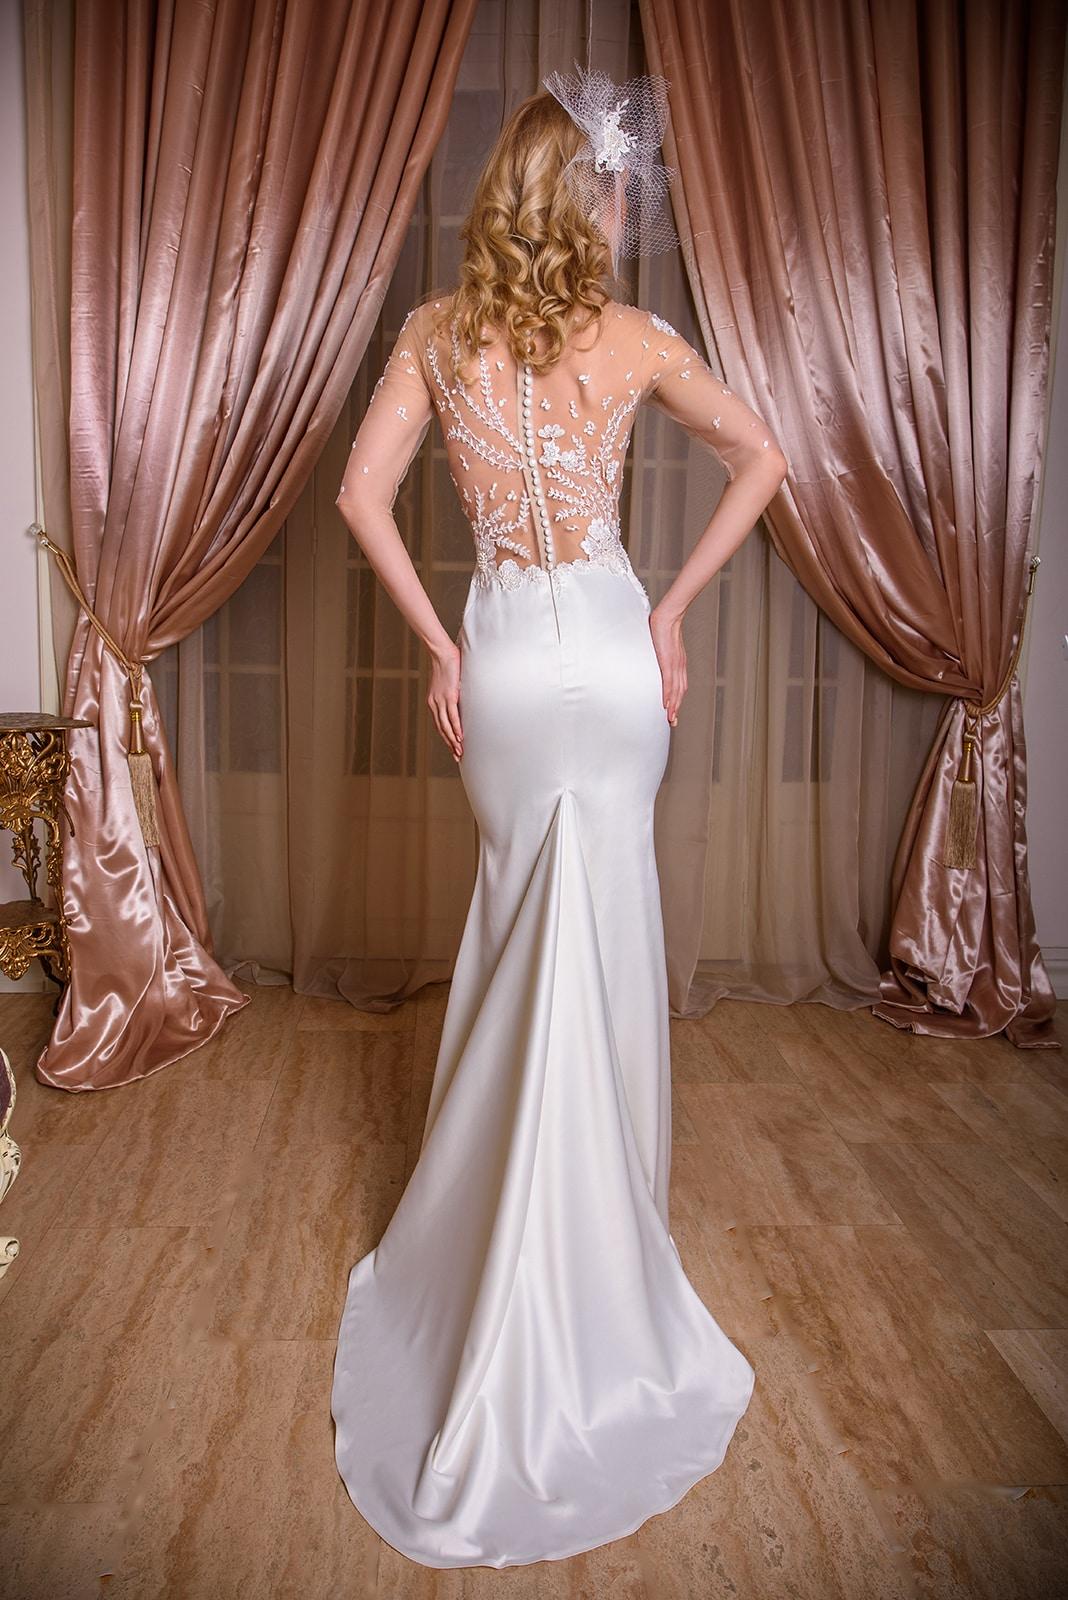 Nelda Model - Colectia Baroque - Adora Sposa (2)